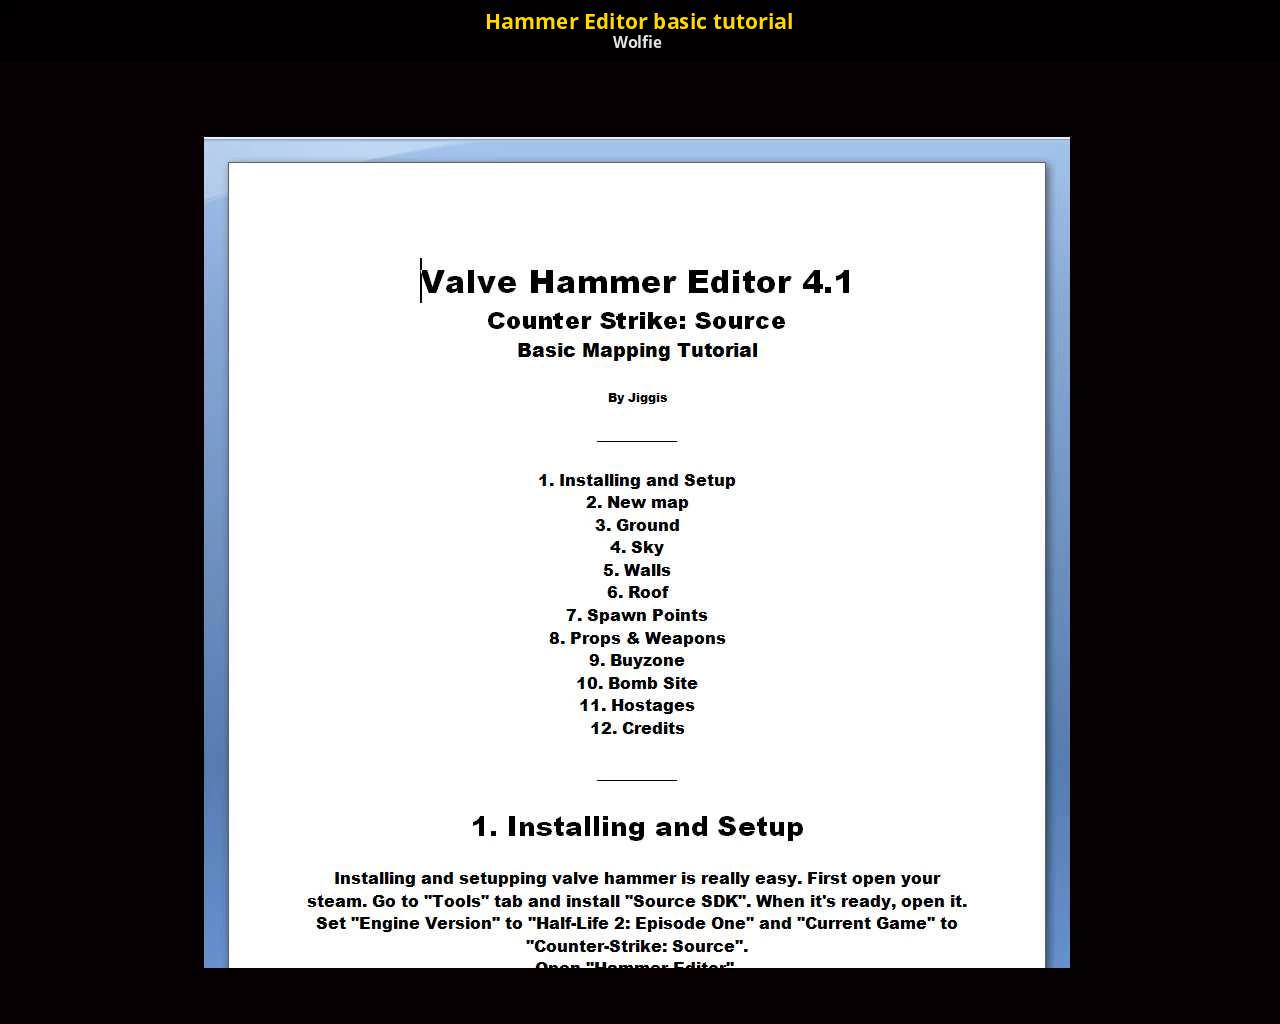 Hammer Editor basic tutorial [Counter-Strike: Source] [Tutorials]